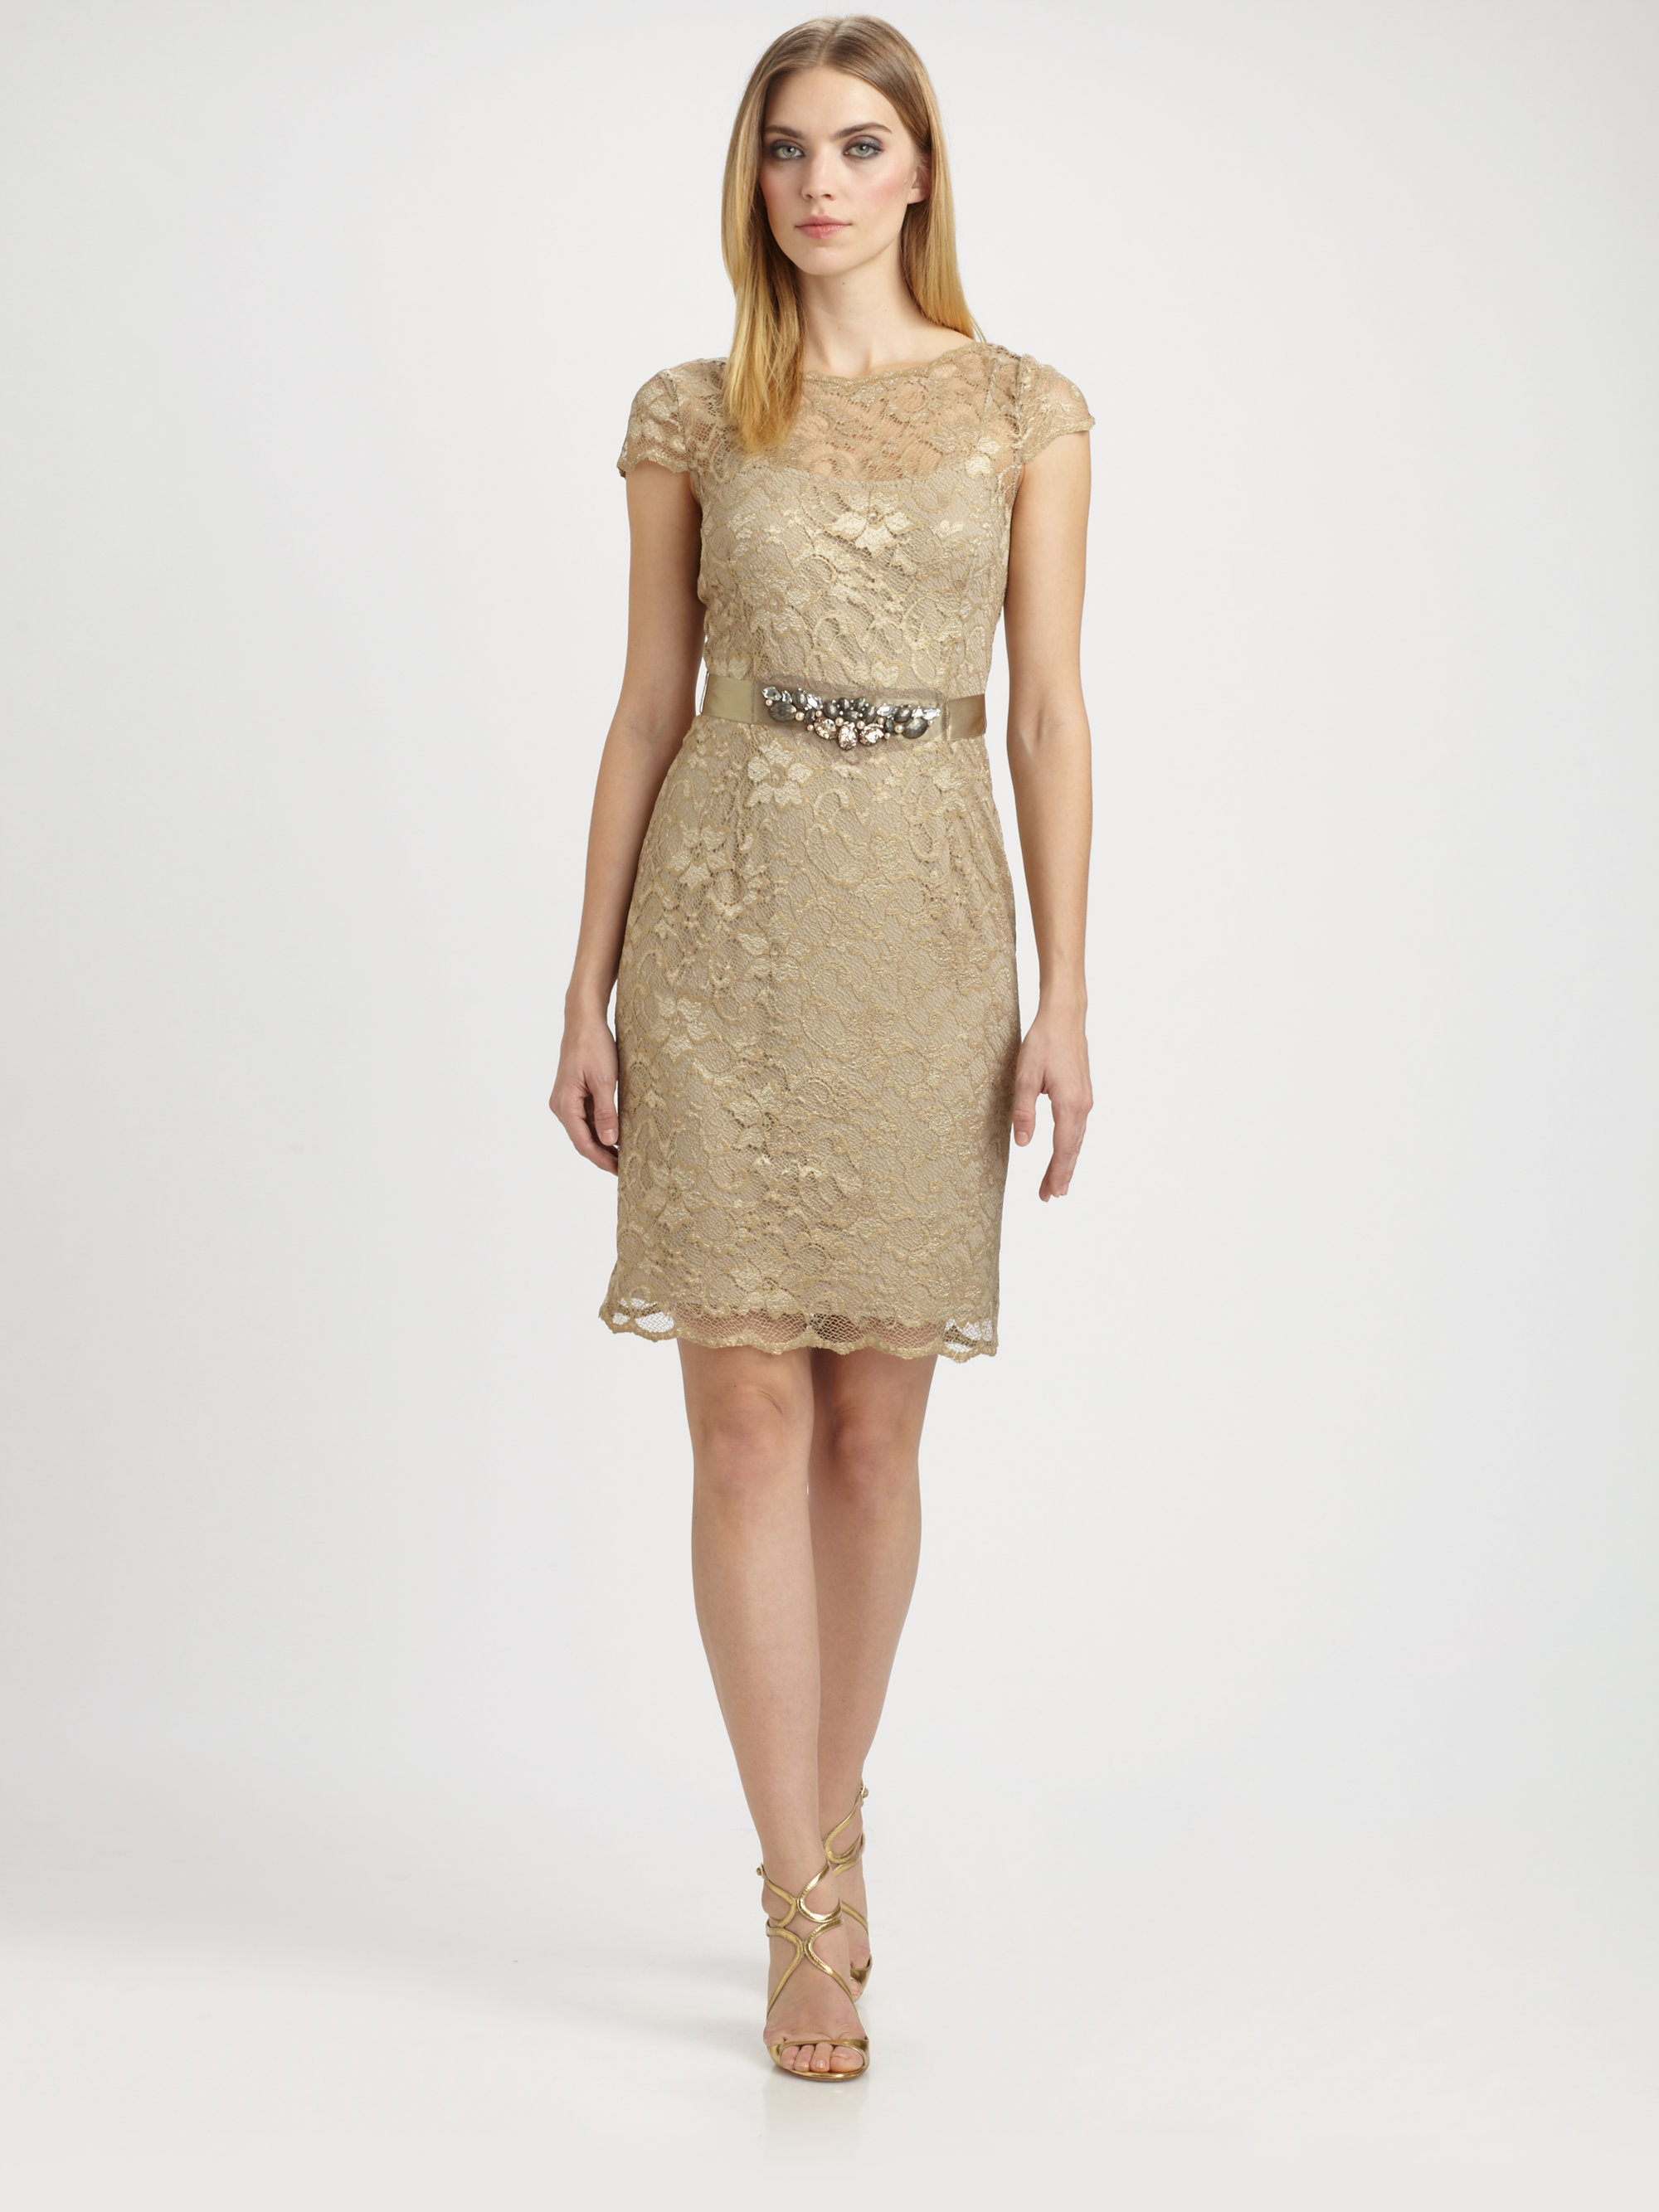 Gold Lace Dresses Ejn Dress